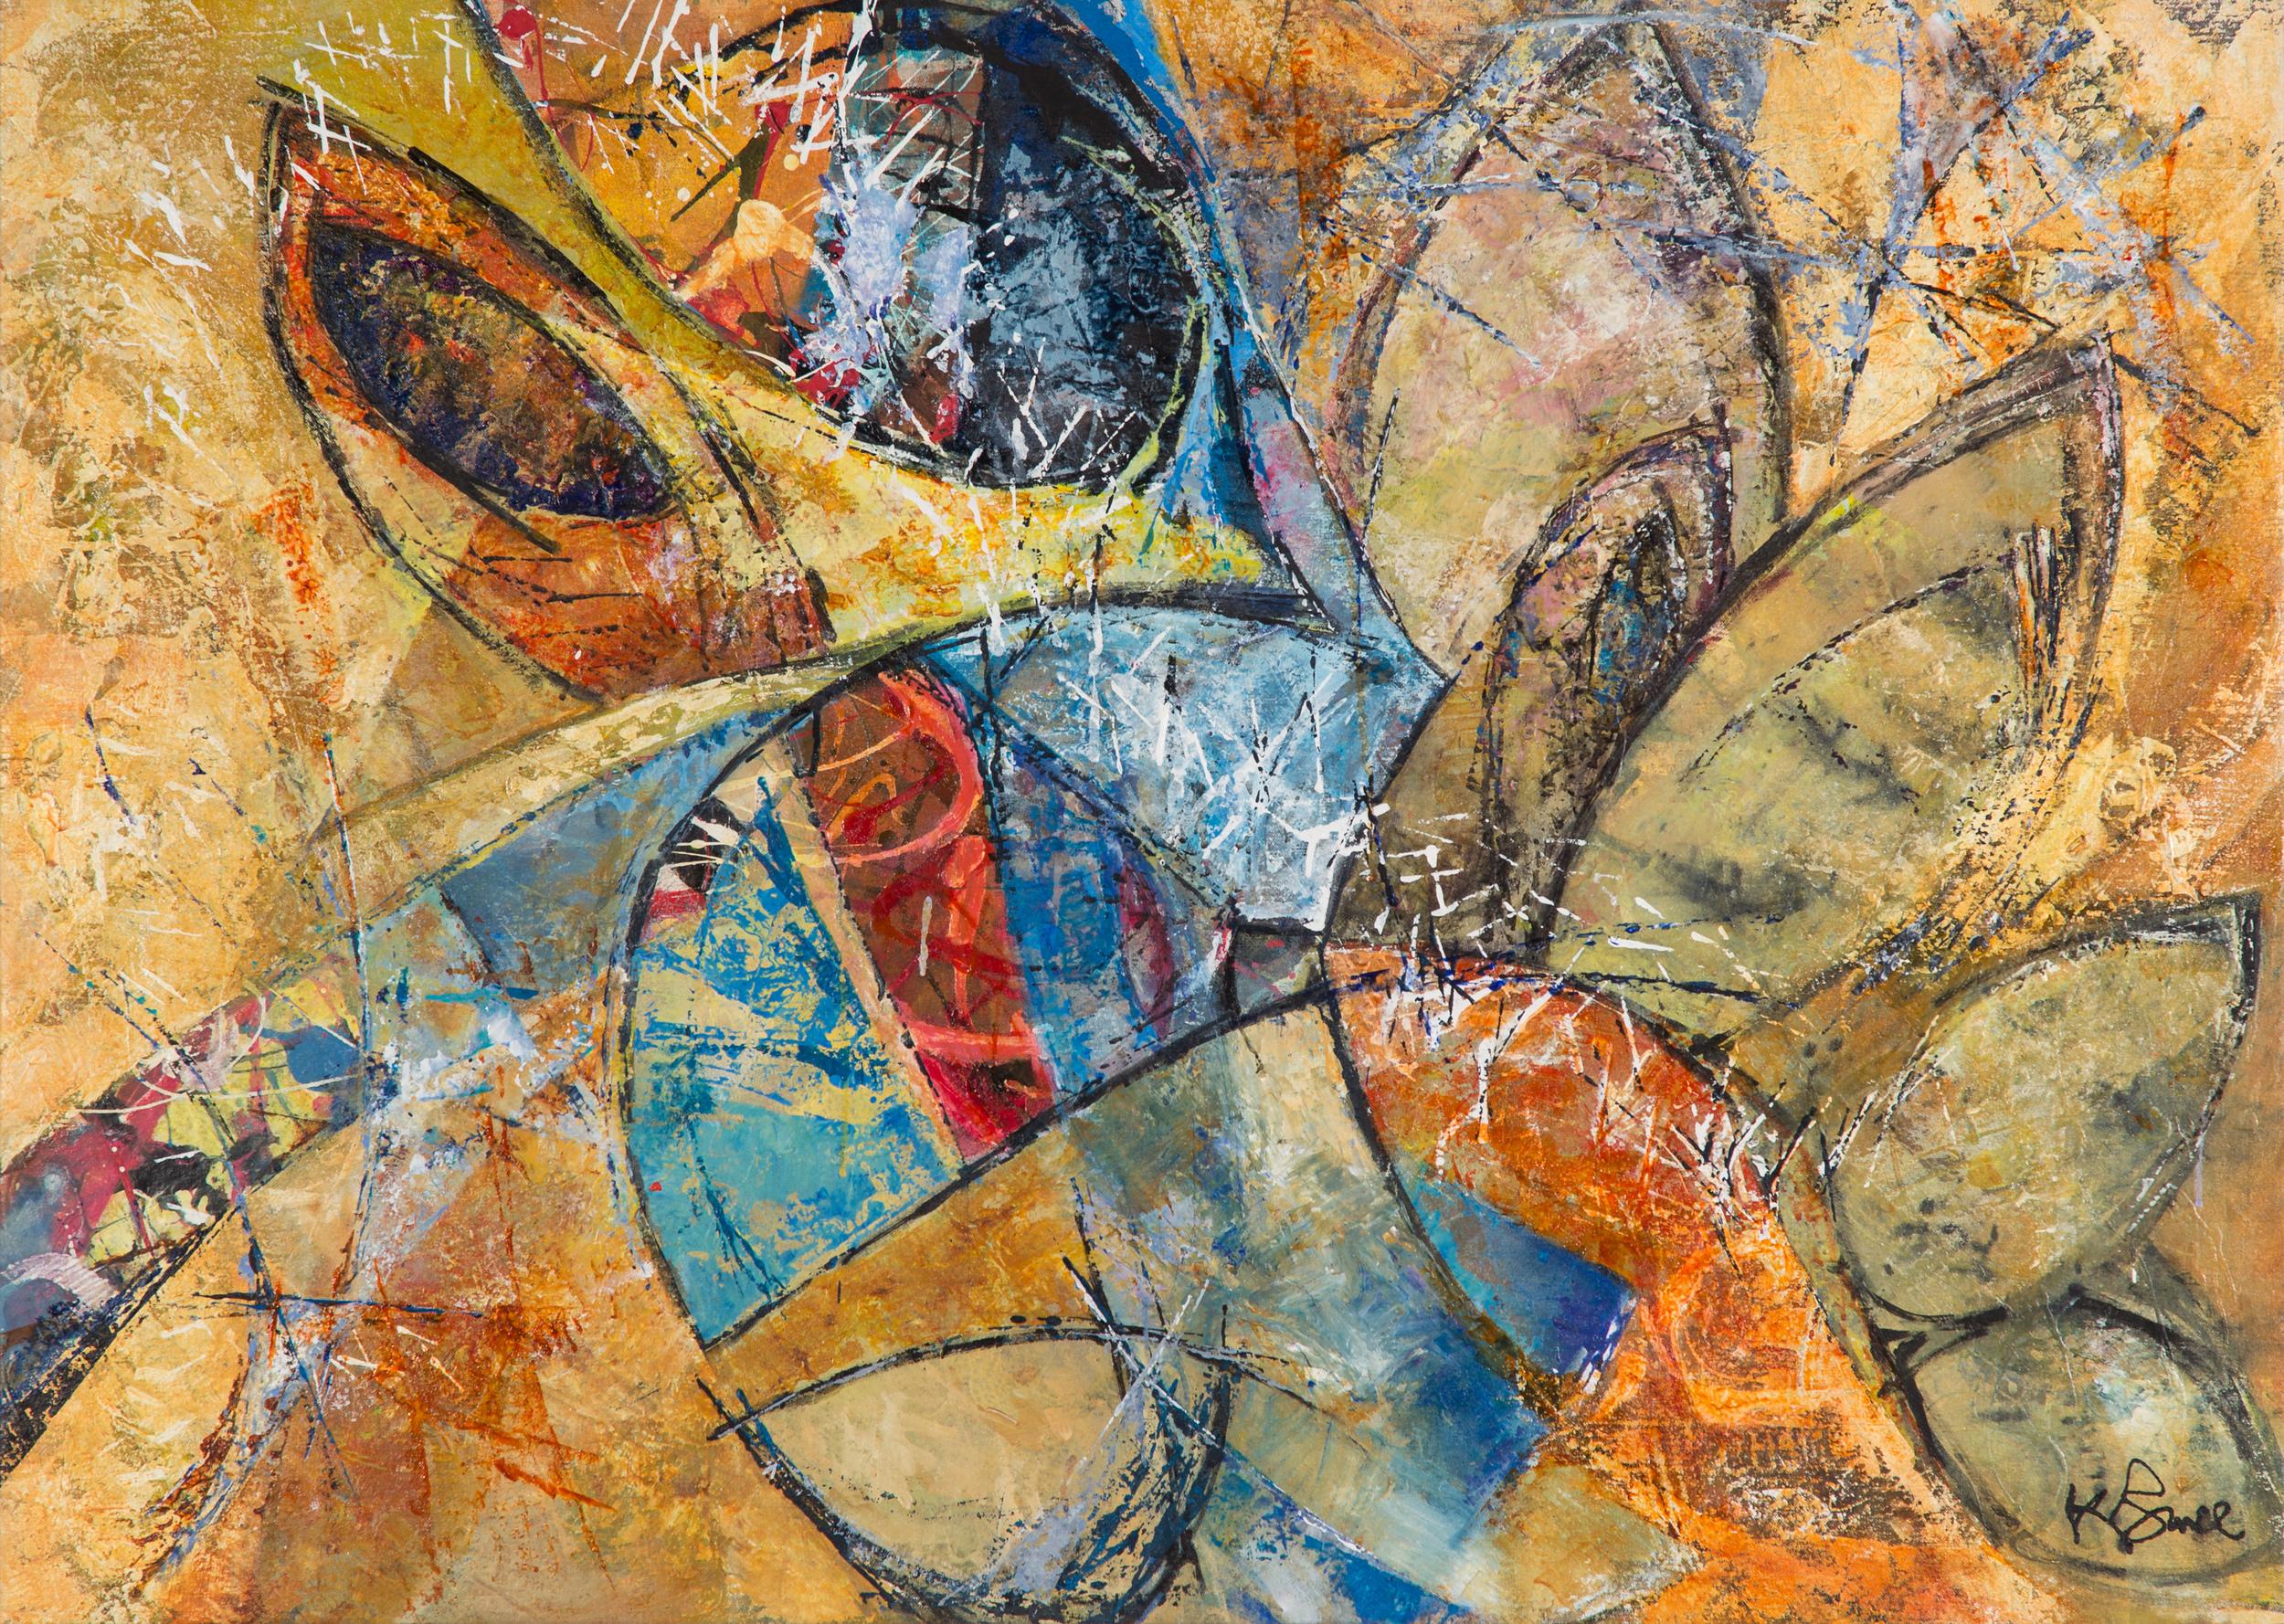 KB-072, Katharine Bruce, Secret Healer, 2014, Acrylic on Canvas, 51 x 36.5, $3,525